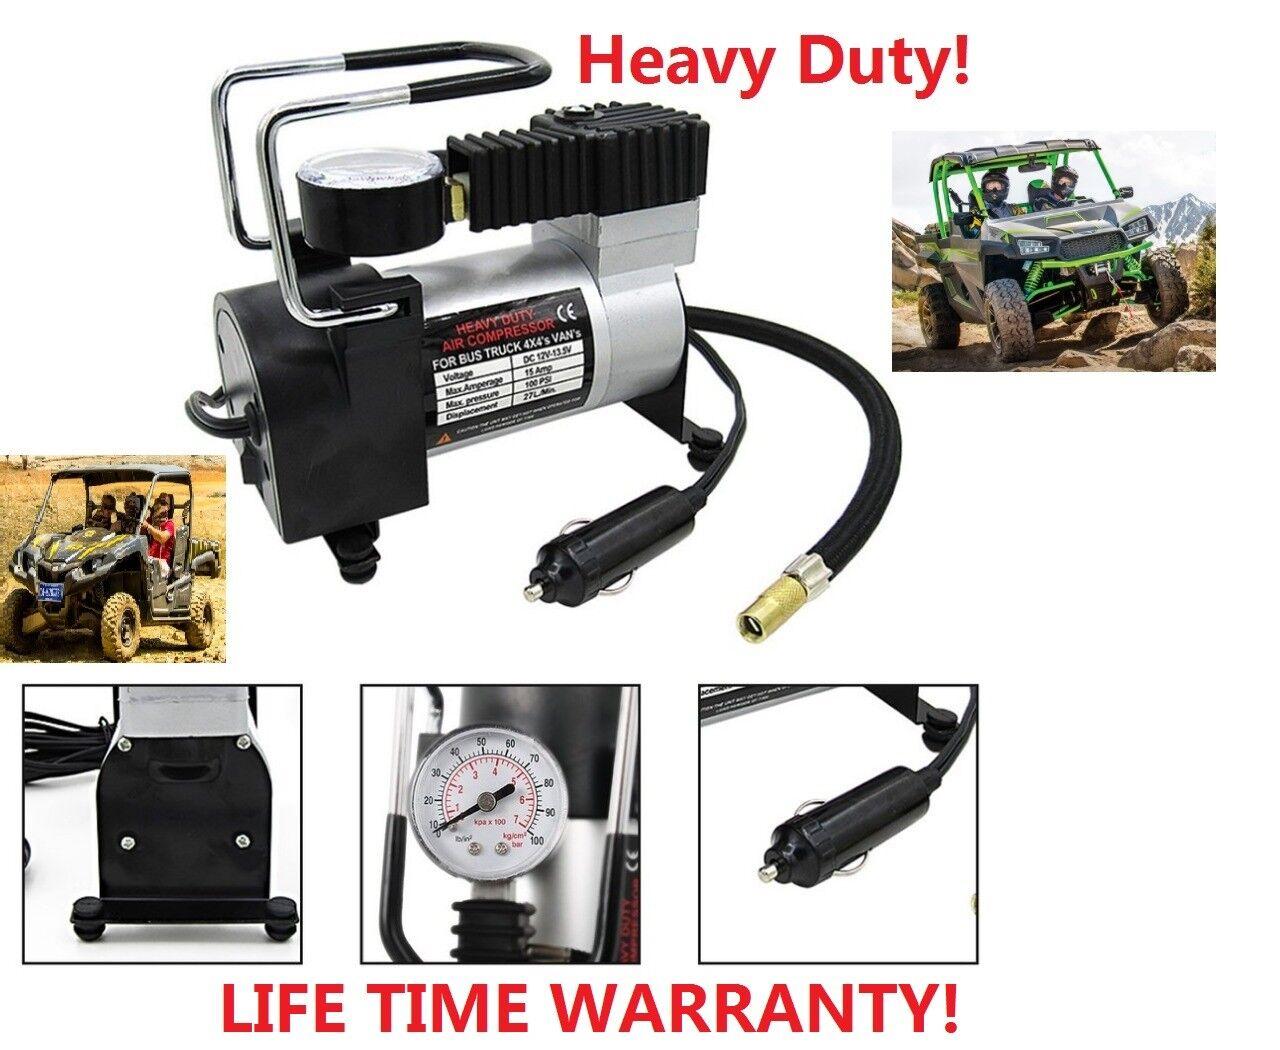 Heavy Duty Portable 12V 1 Car  Tire Inflator Pump Air Compre